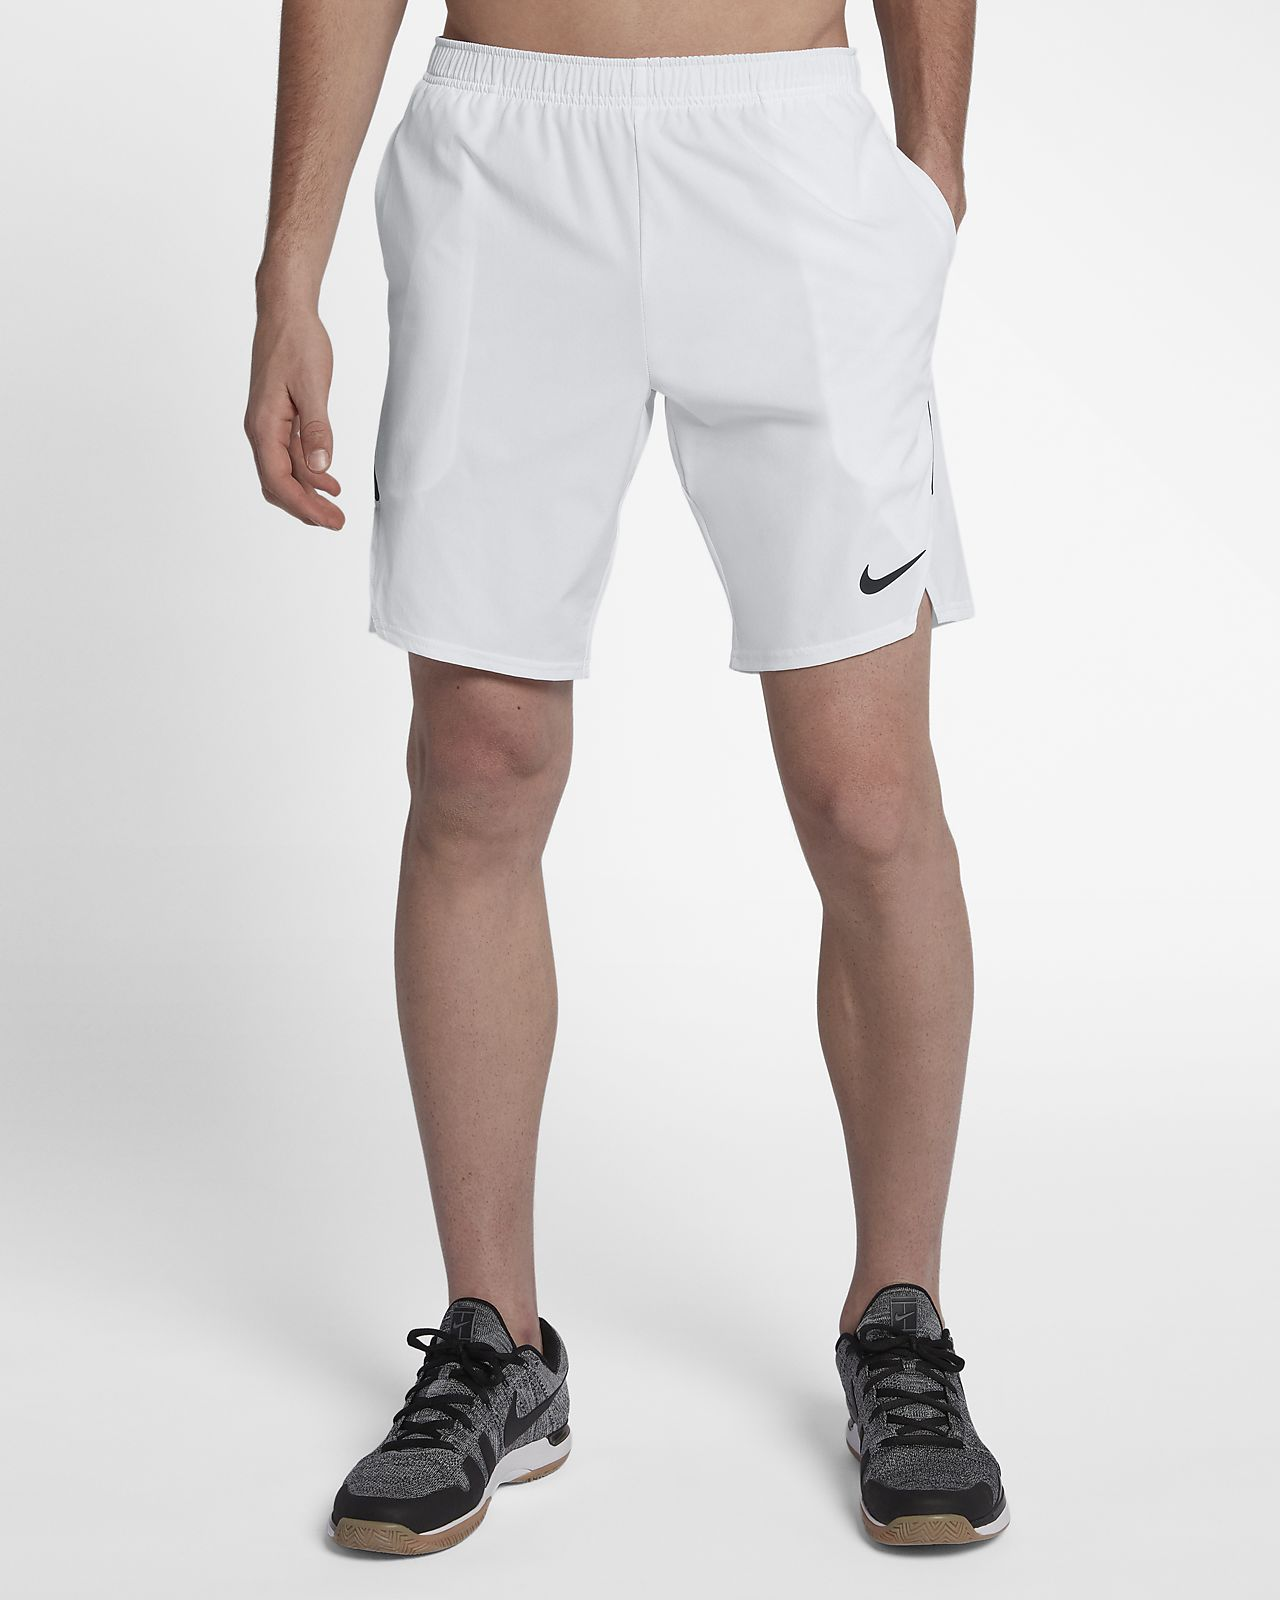 NikeCourt Flex Ace-tennisshorts til mænd